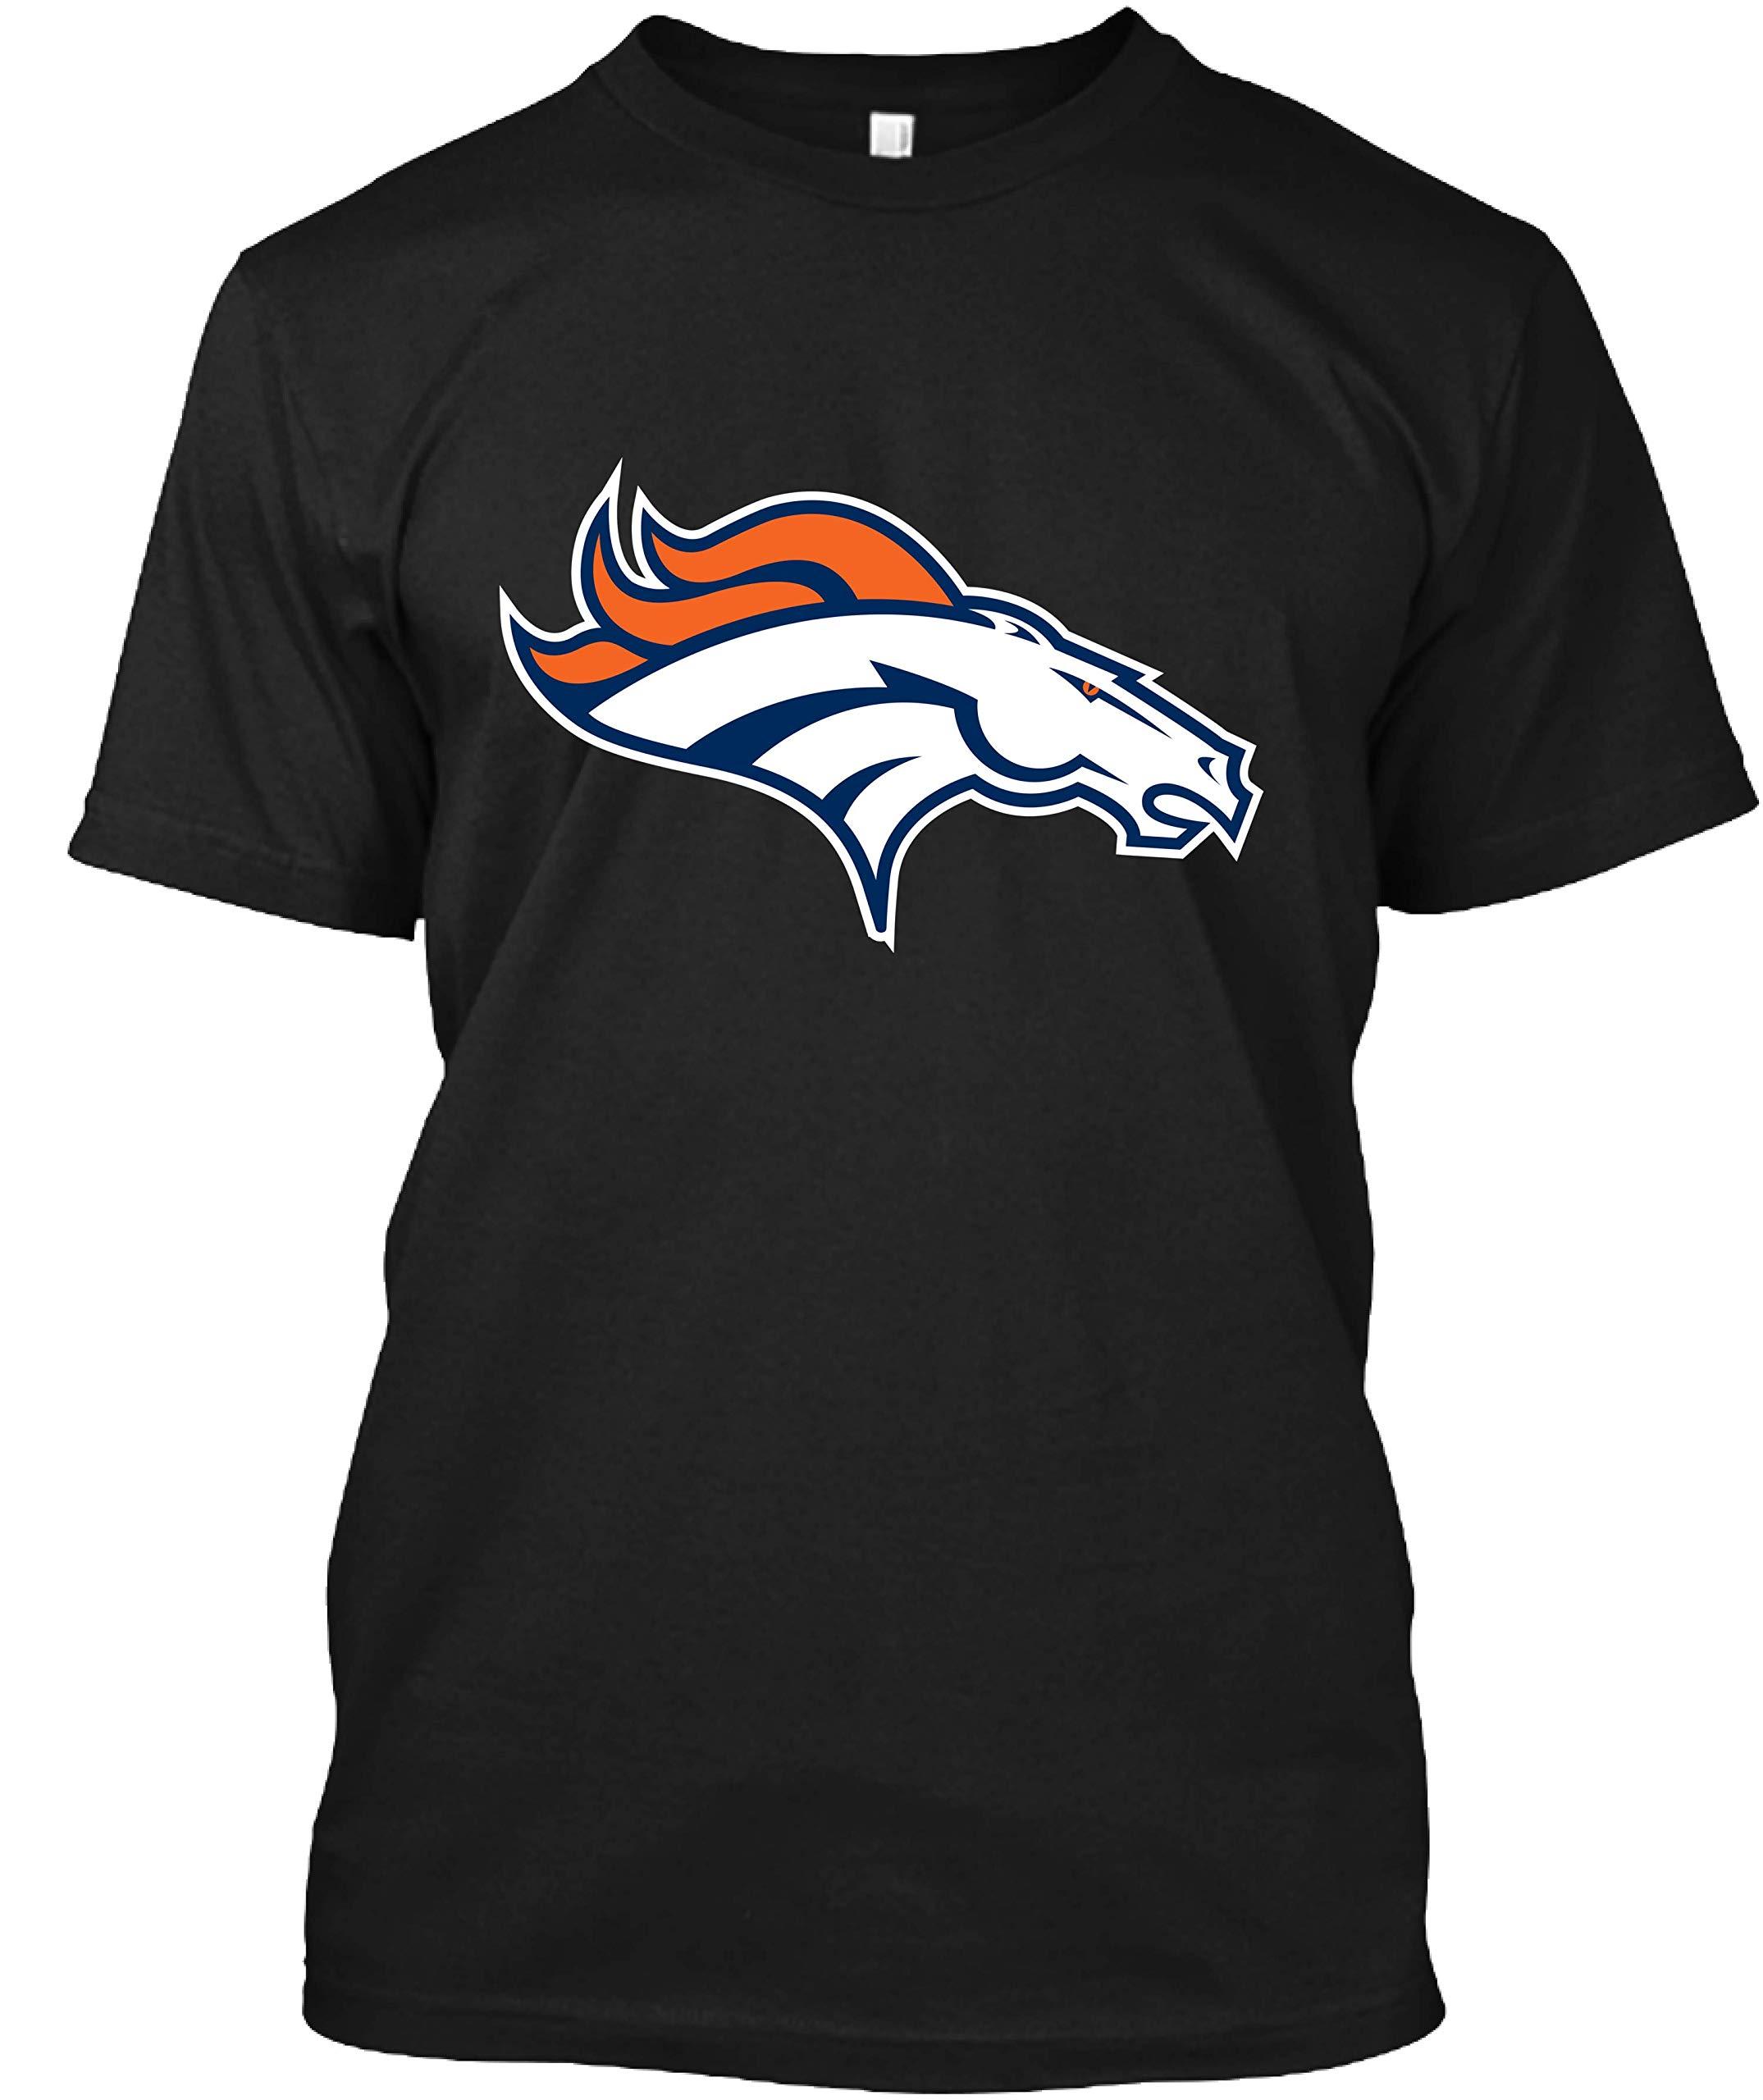 Campbe Sarah Denver Broncos Logo Woman Tshirt